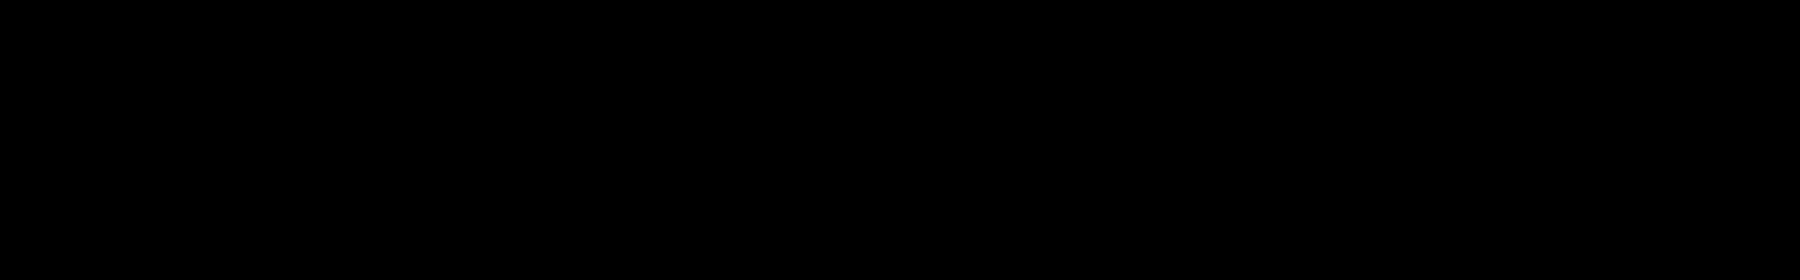 CHAINLAZERZ - Future Pop & Future Bass BUNDLE audio waveform